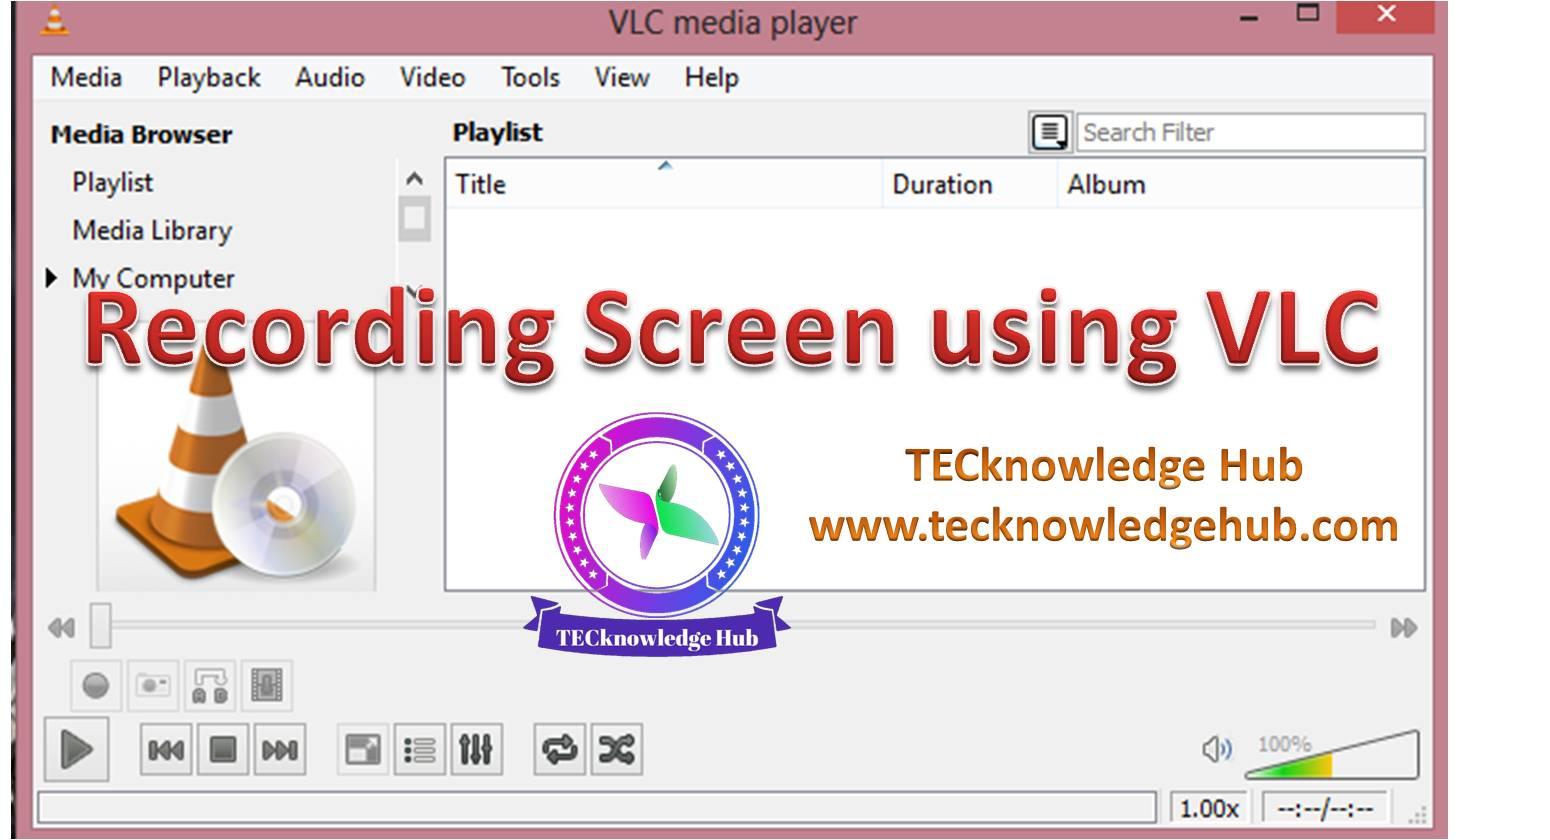 RECORDING SCREEN USING VLC PLAYER - TECknowledge HUB